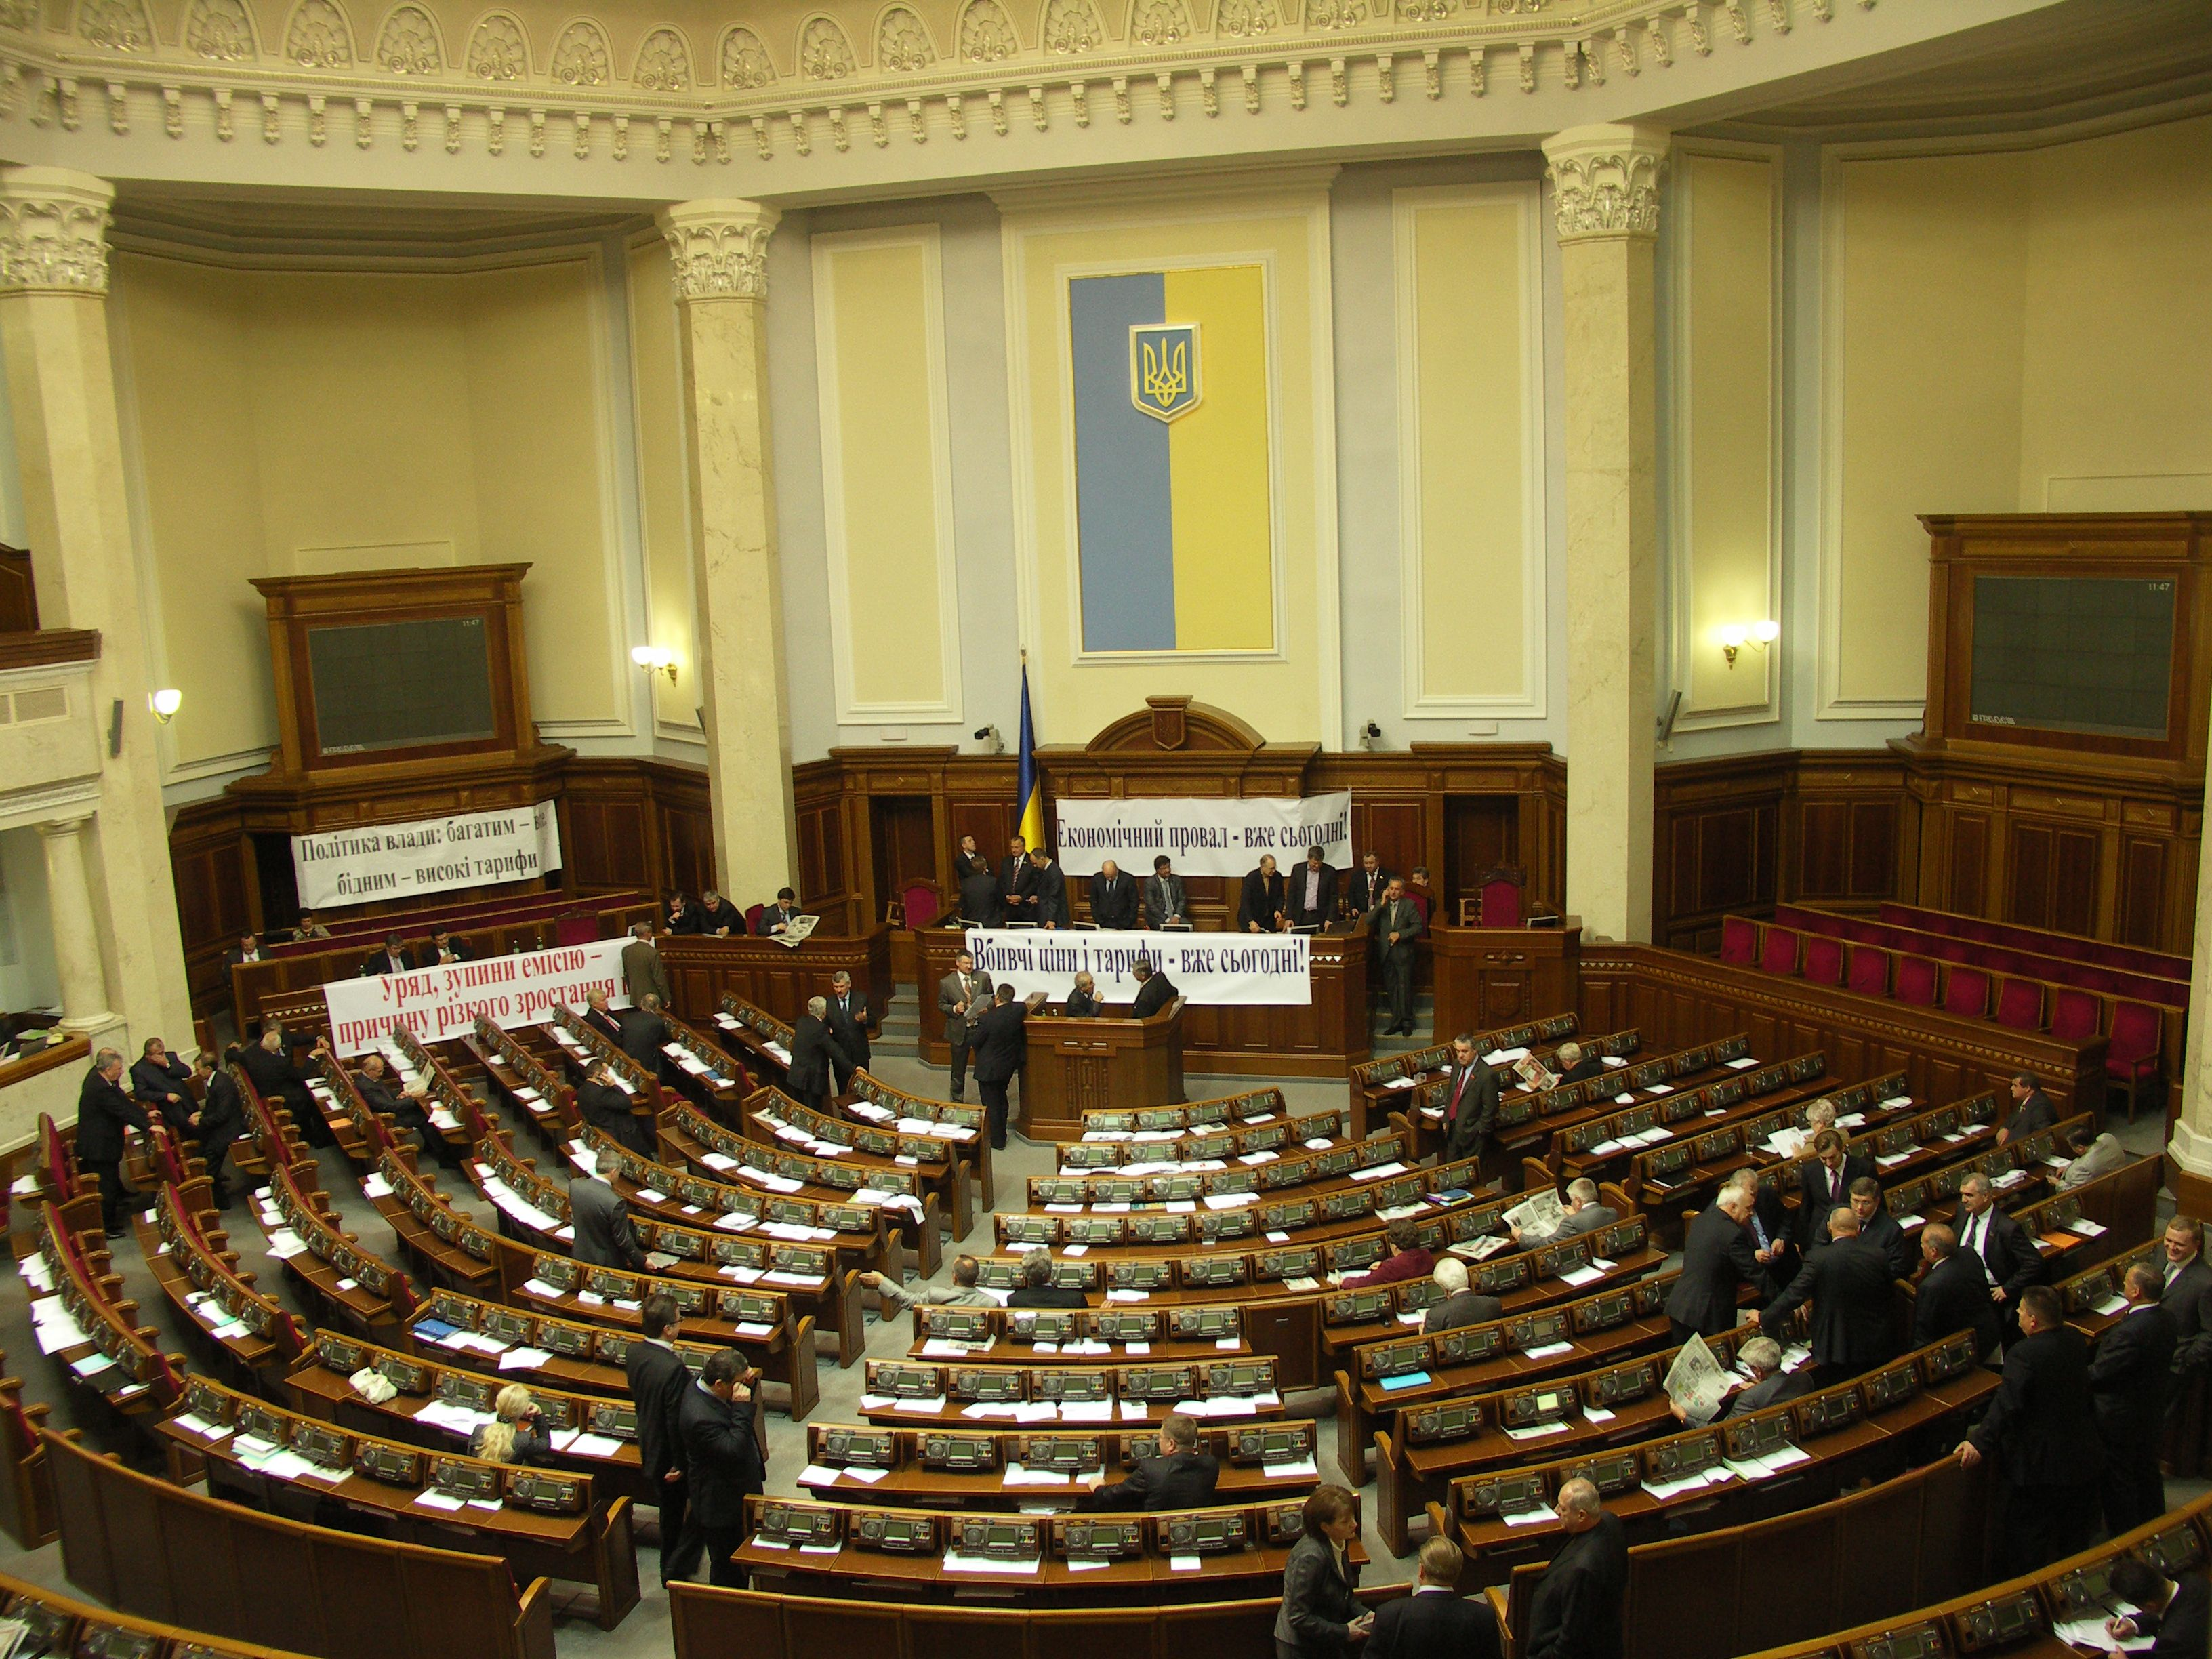 Det ukrainske parlament - Verkovna Rada  Foto: Ota Tiefenböck